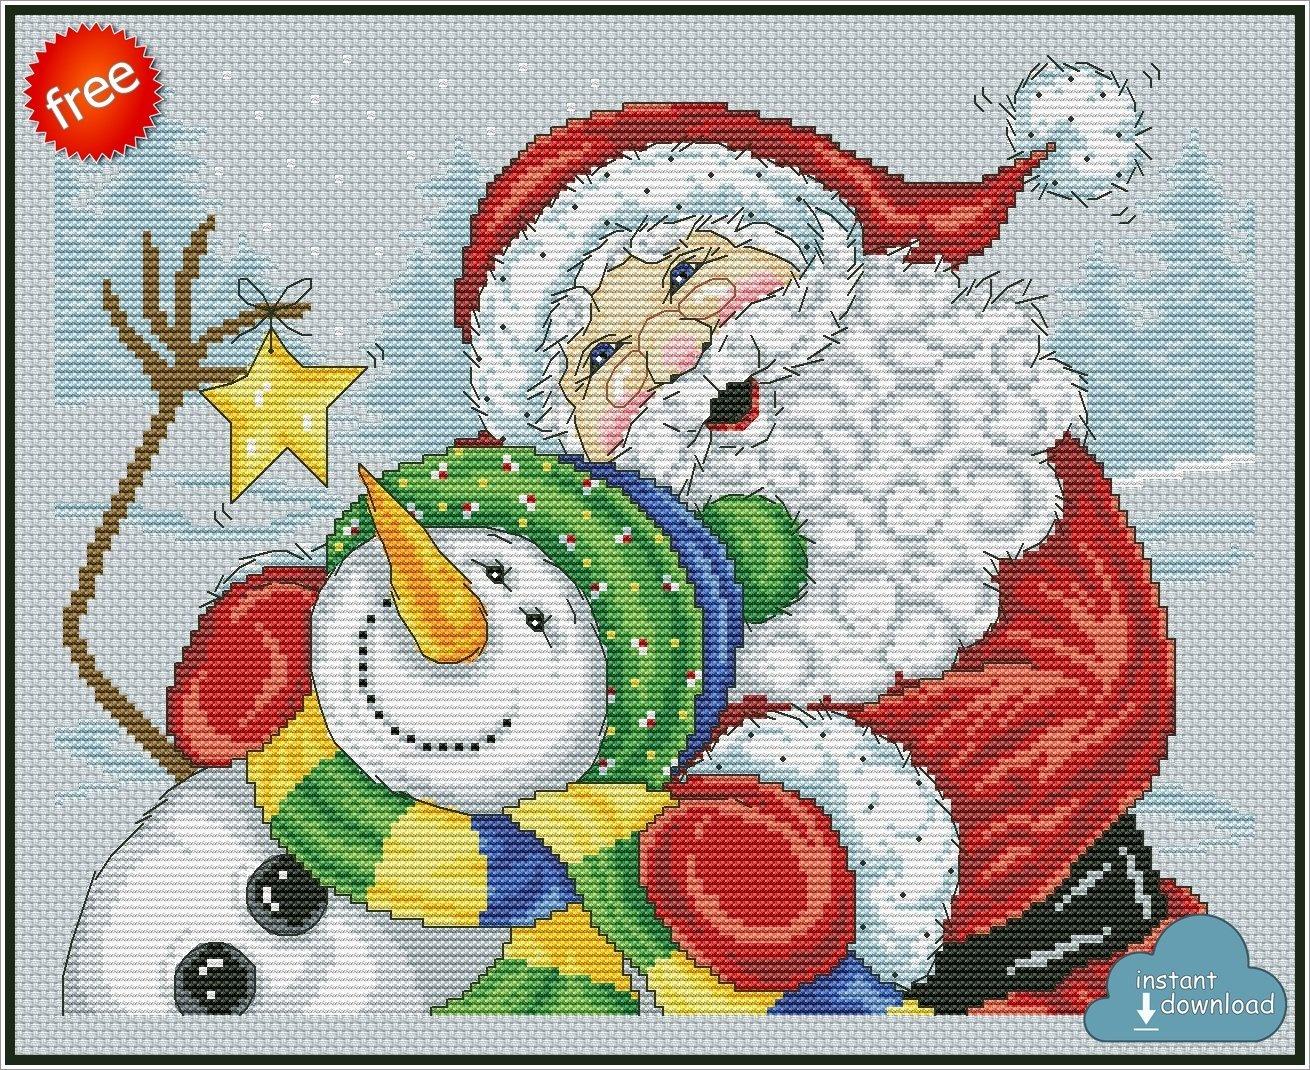 Merry Christmas Cross Stitch Pattern Xsd Download